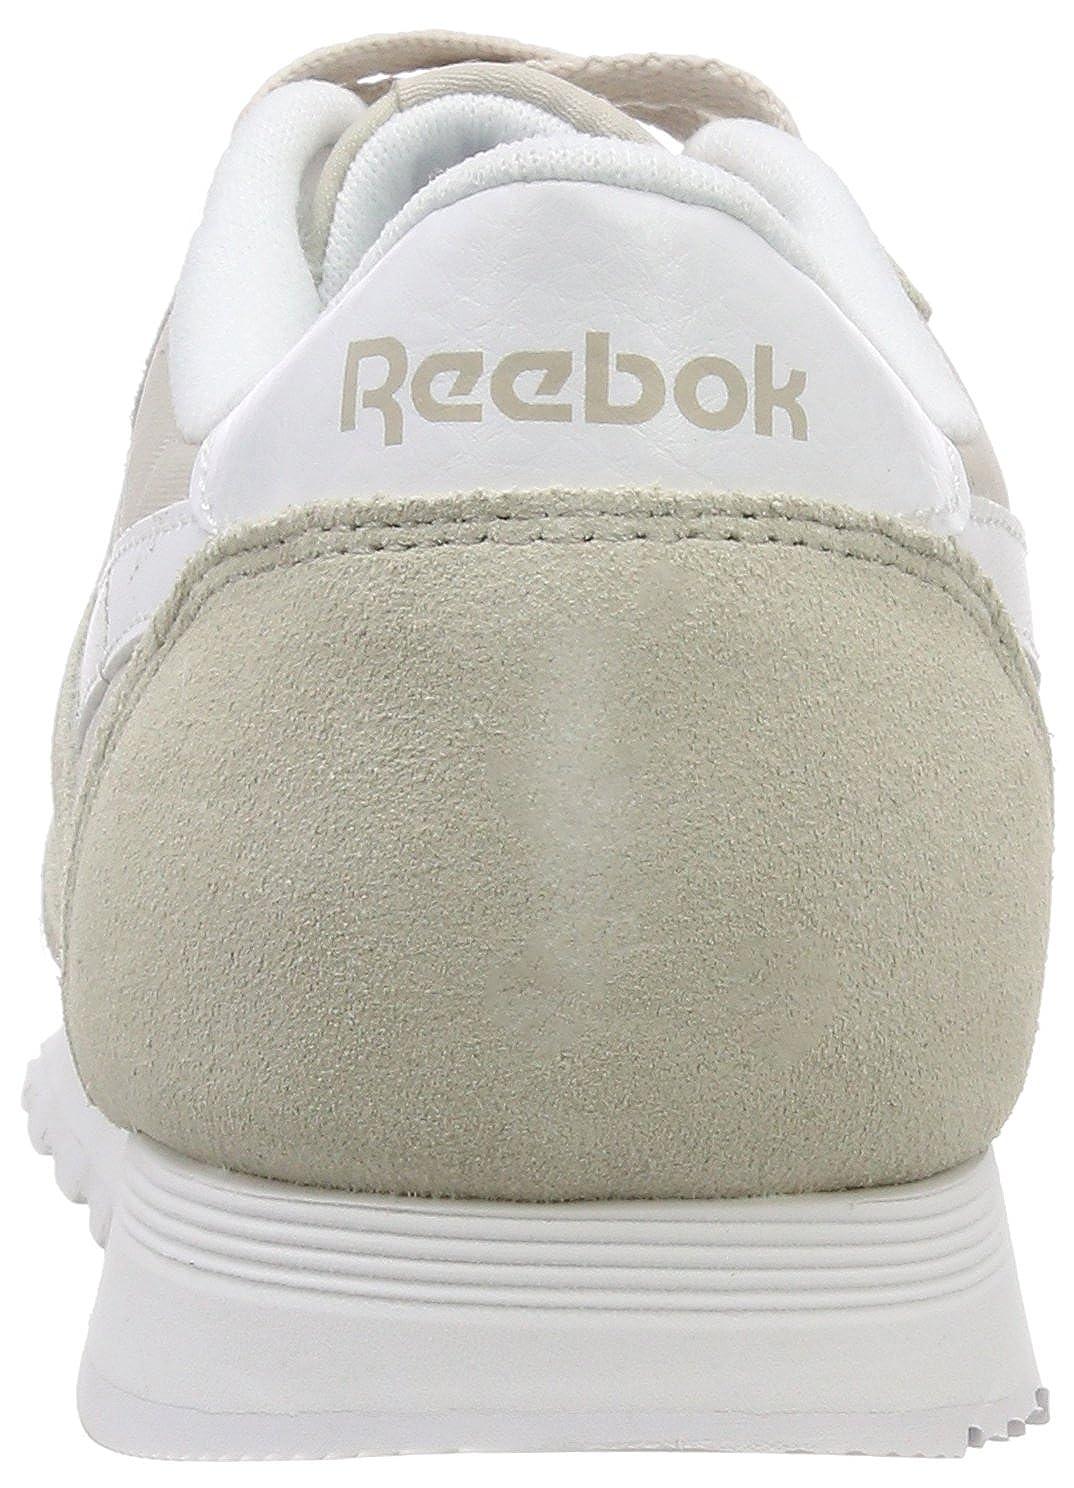 87b5904a05f Reebok Women s Classic Nylon Neutrals Trainers  Amazon.co.uk  Shoes   Bags